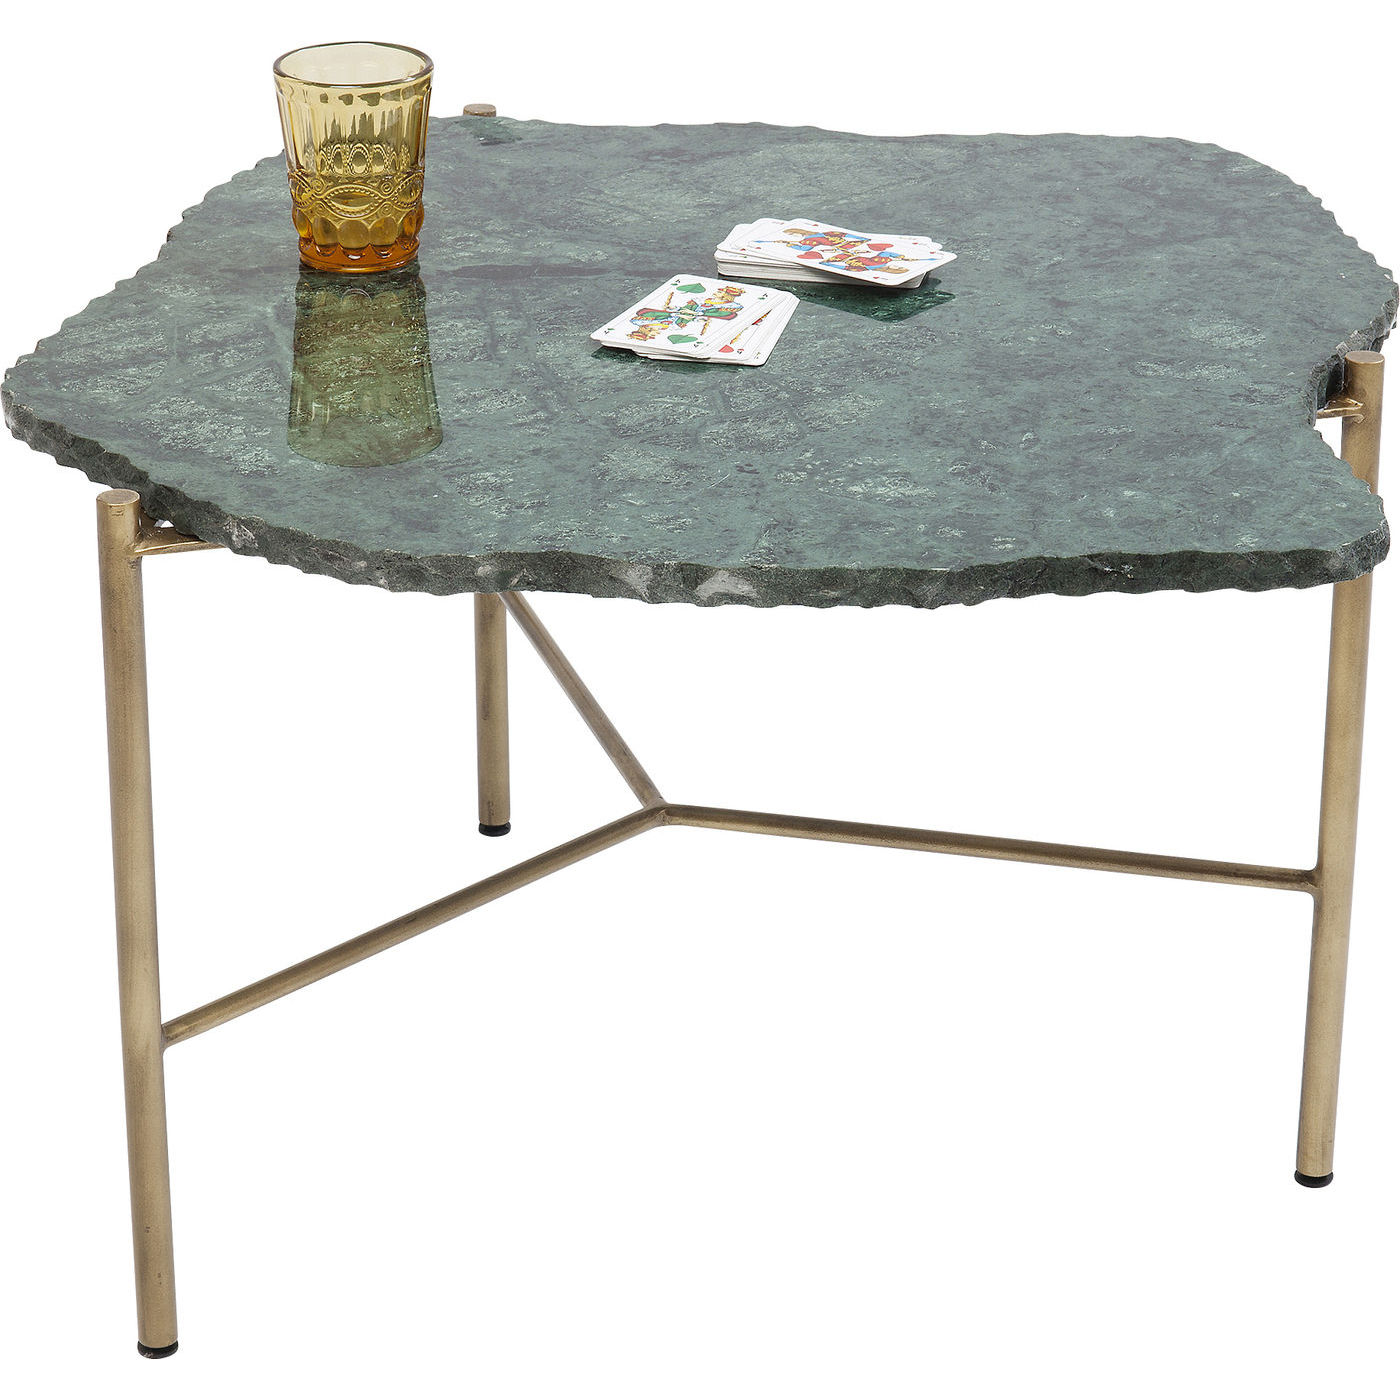 kare design – Kare design piedra green sofabord - grønt marmor/guld stål fra boboonline.dk